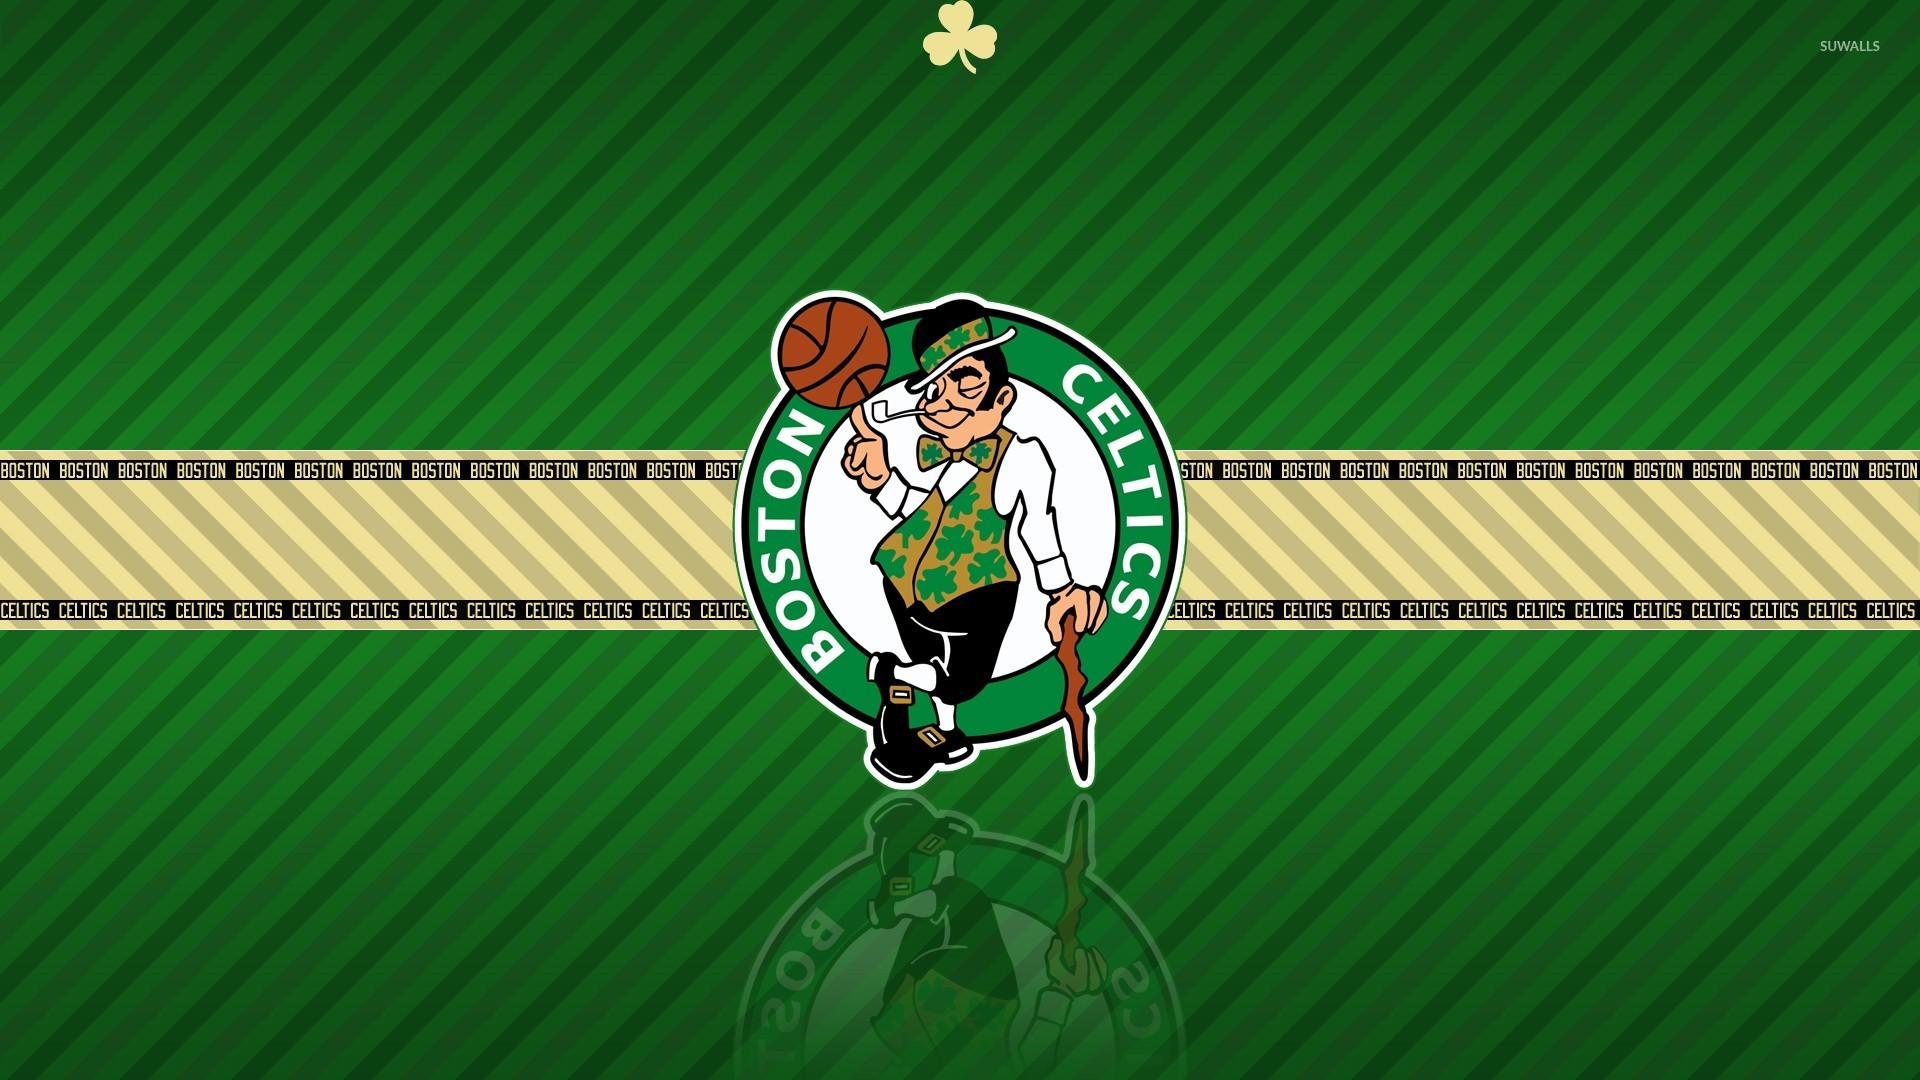 Res Source - Boston Celtics , HD Wallpaper & Backgrounds